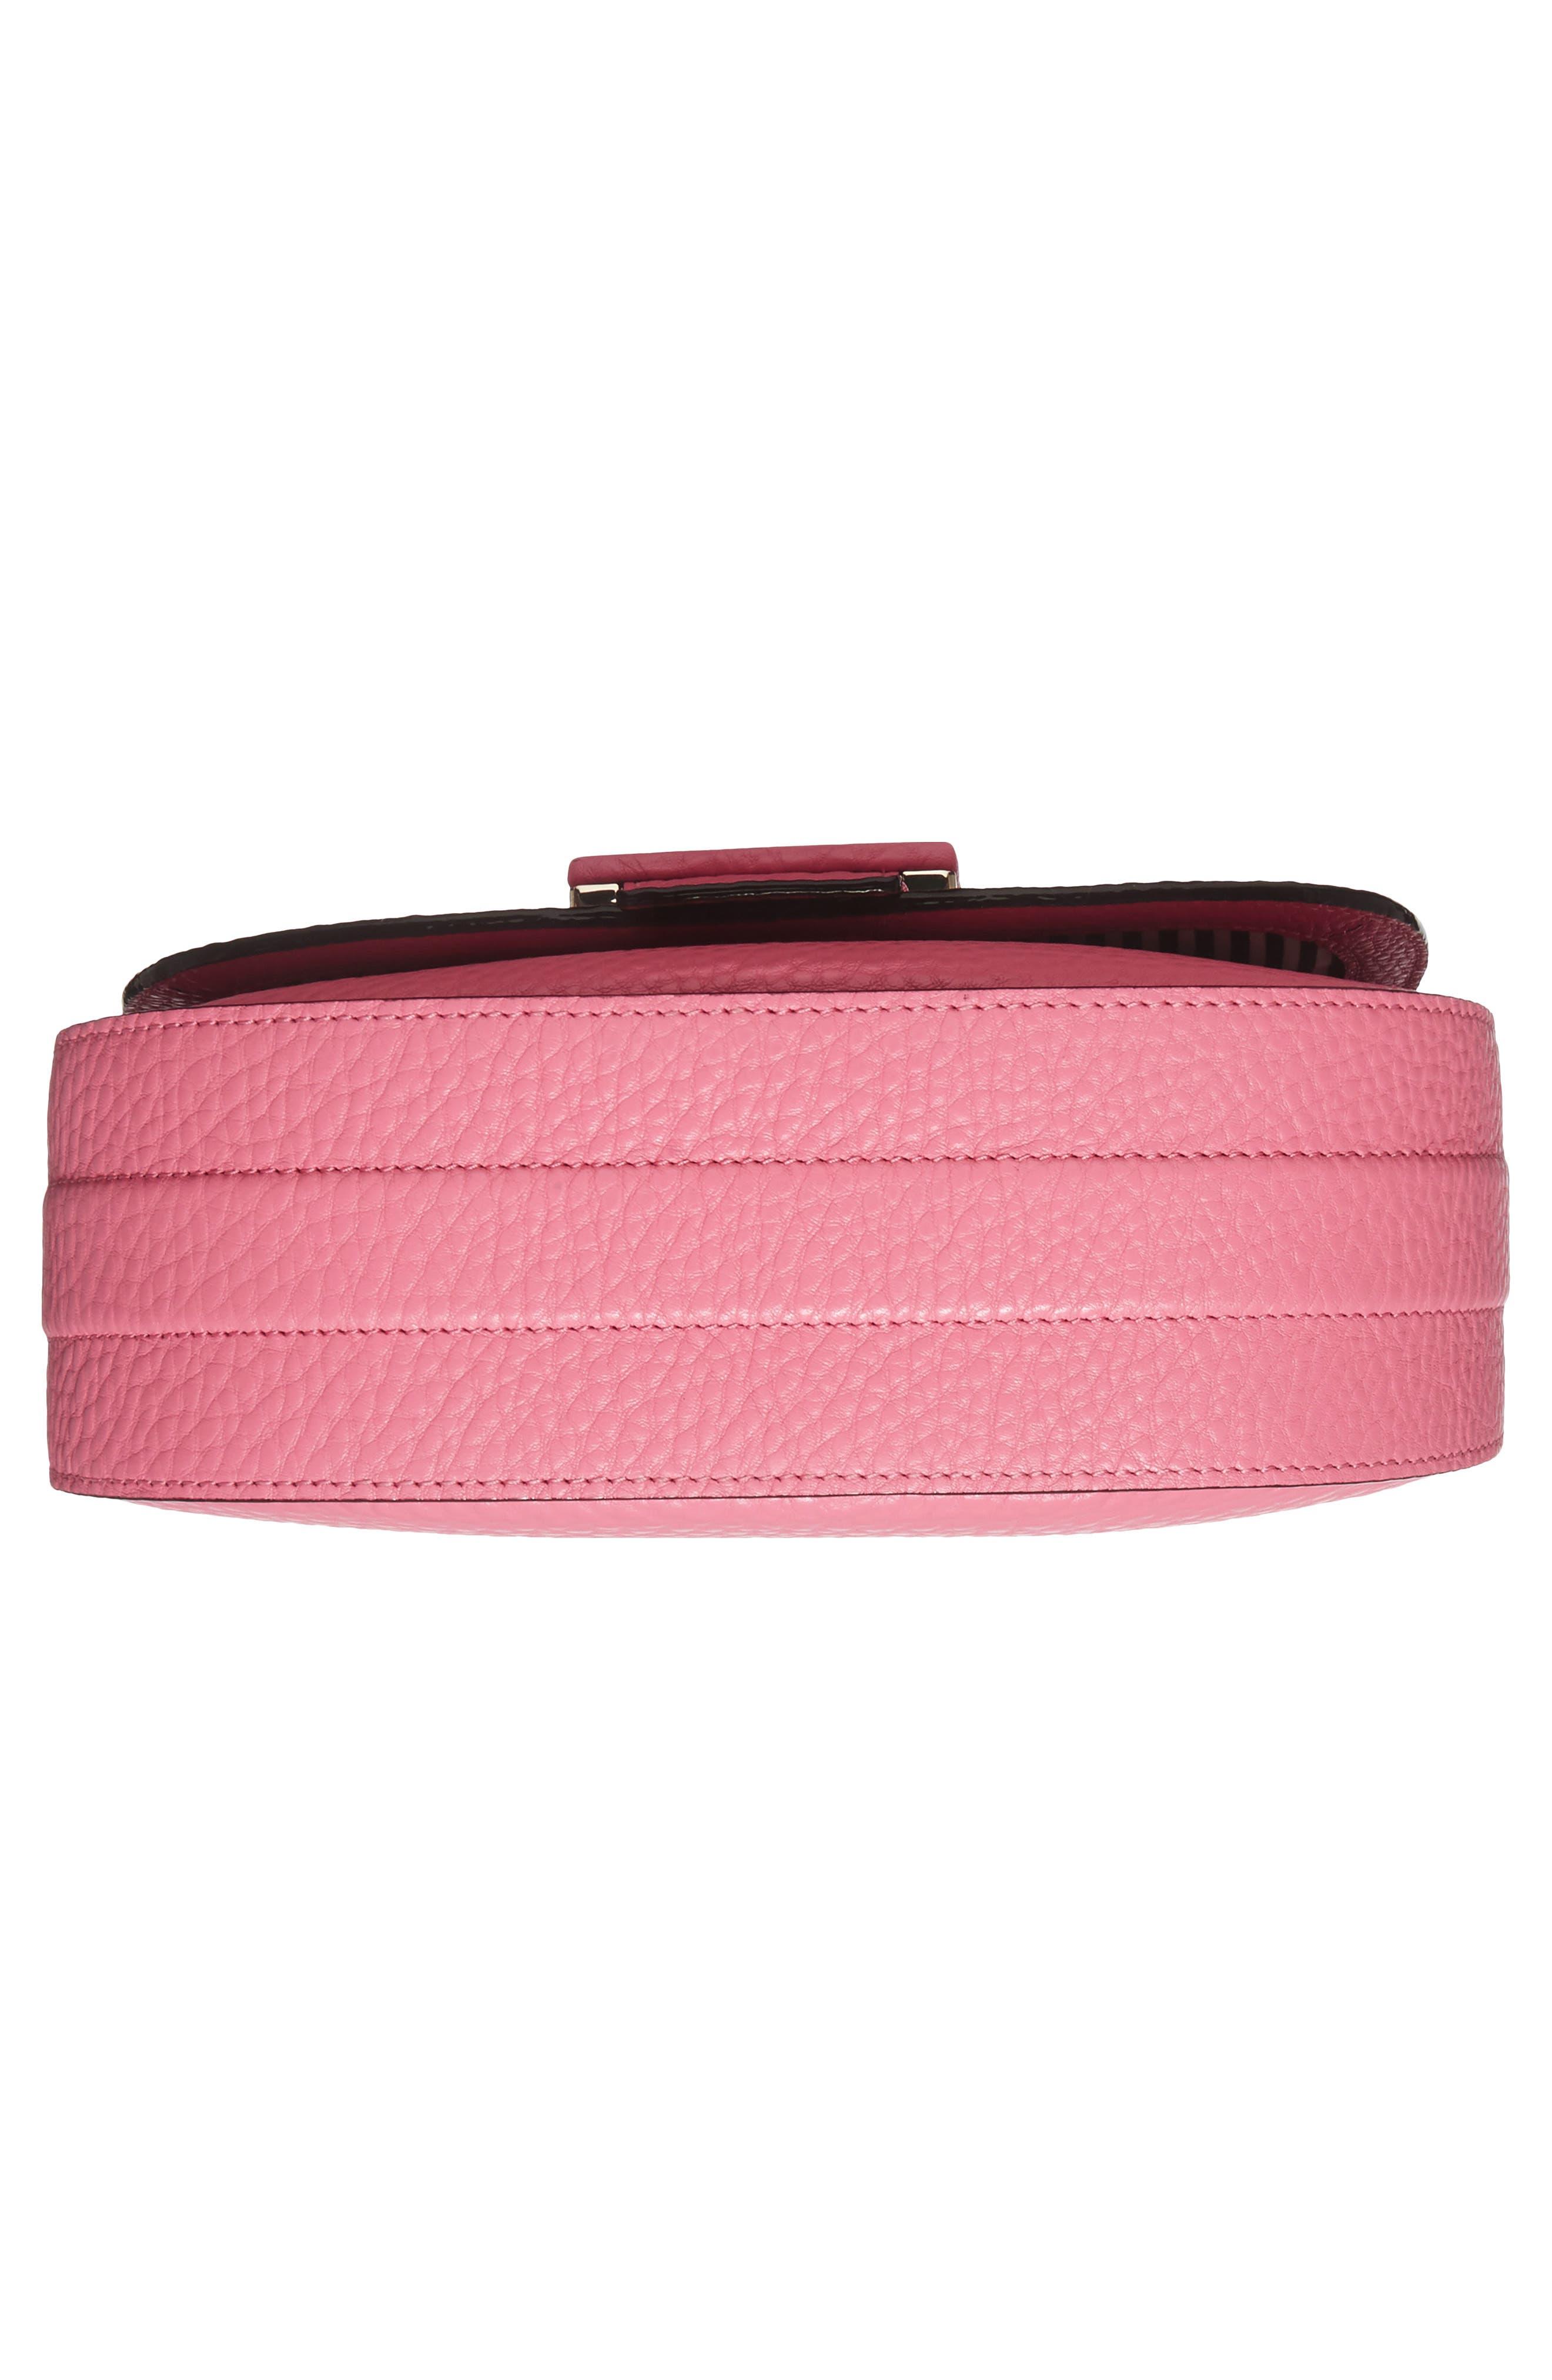 carlyle street - kallie leather saddle bag,                             Alternate thumbnail 6, color,                             Pink Sunset